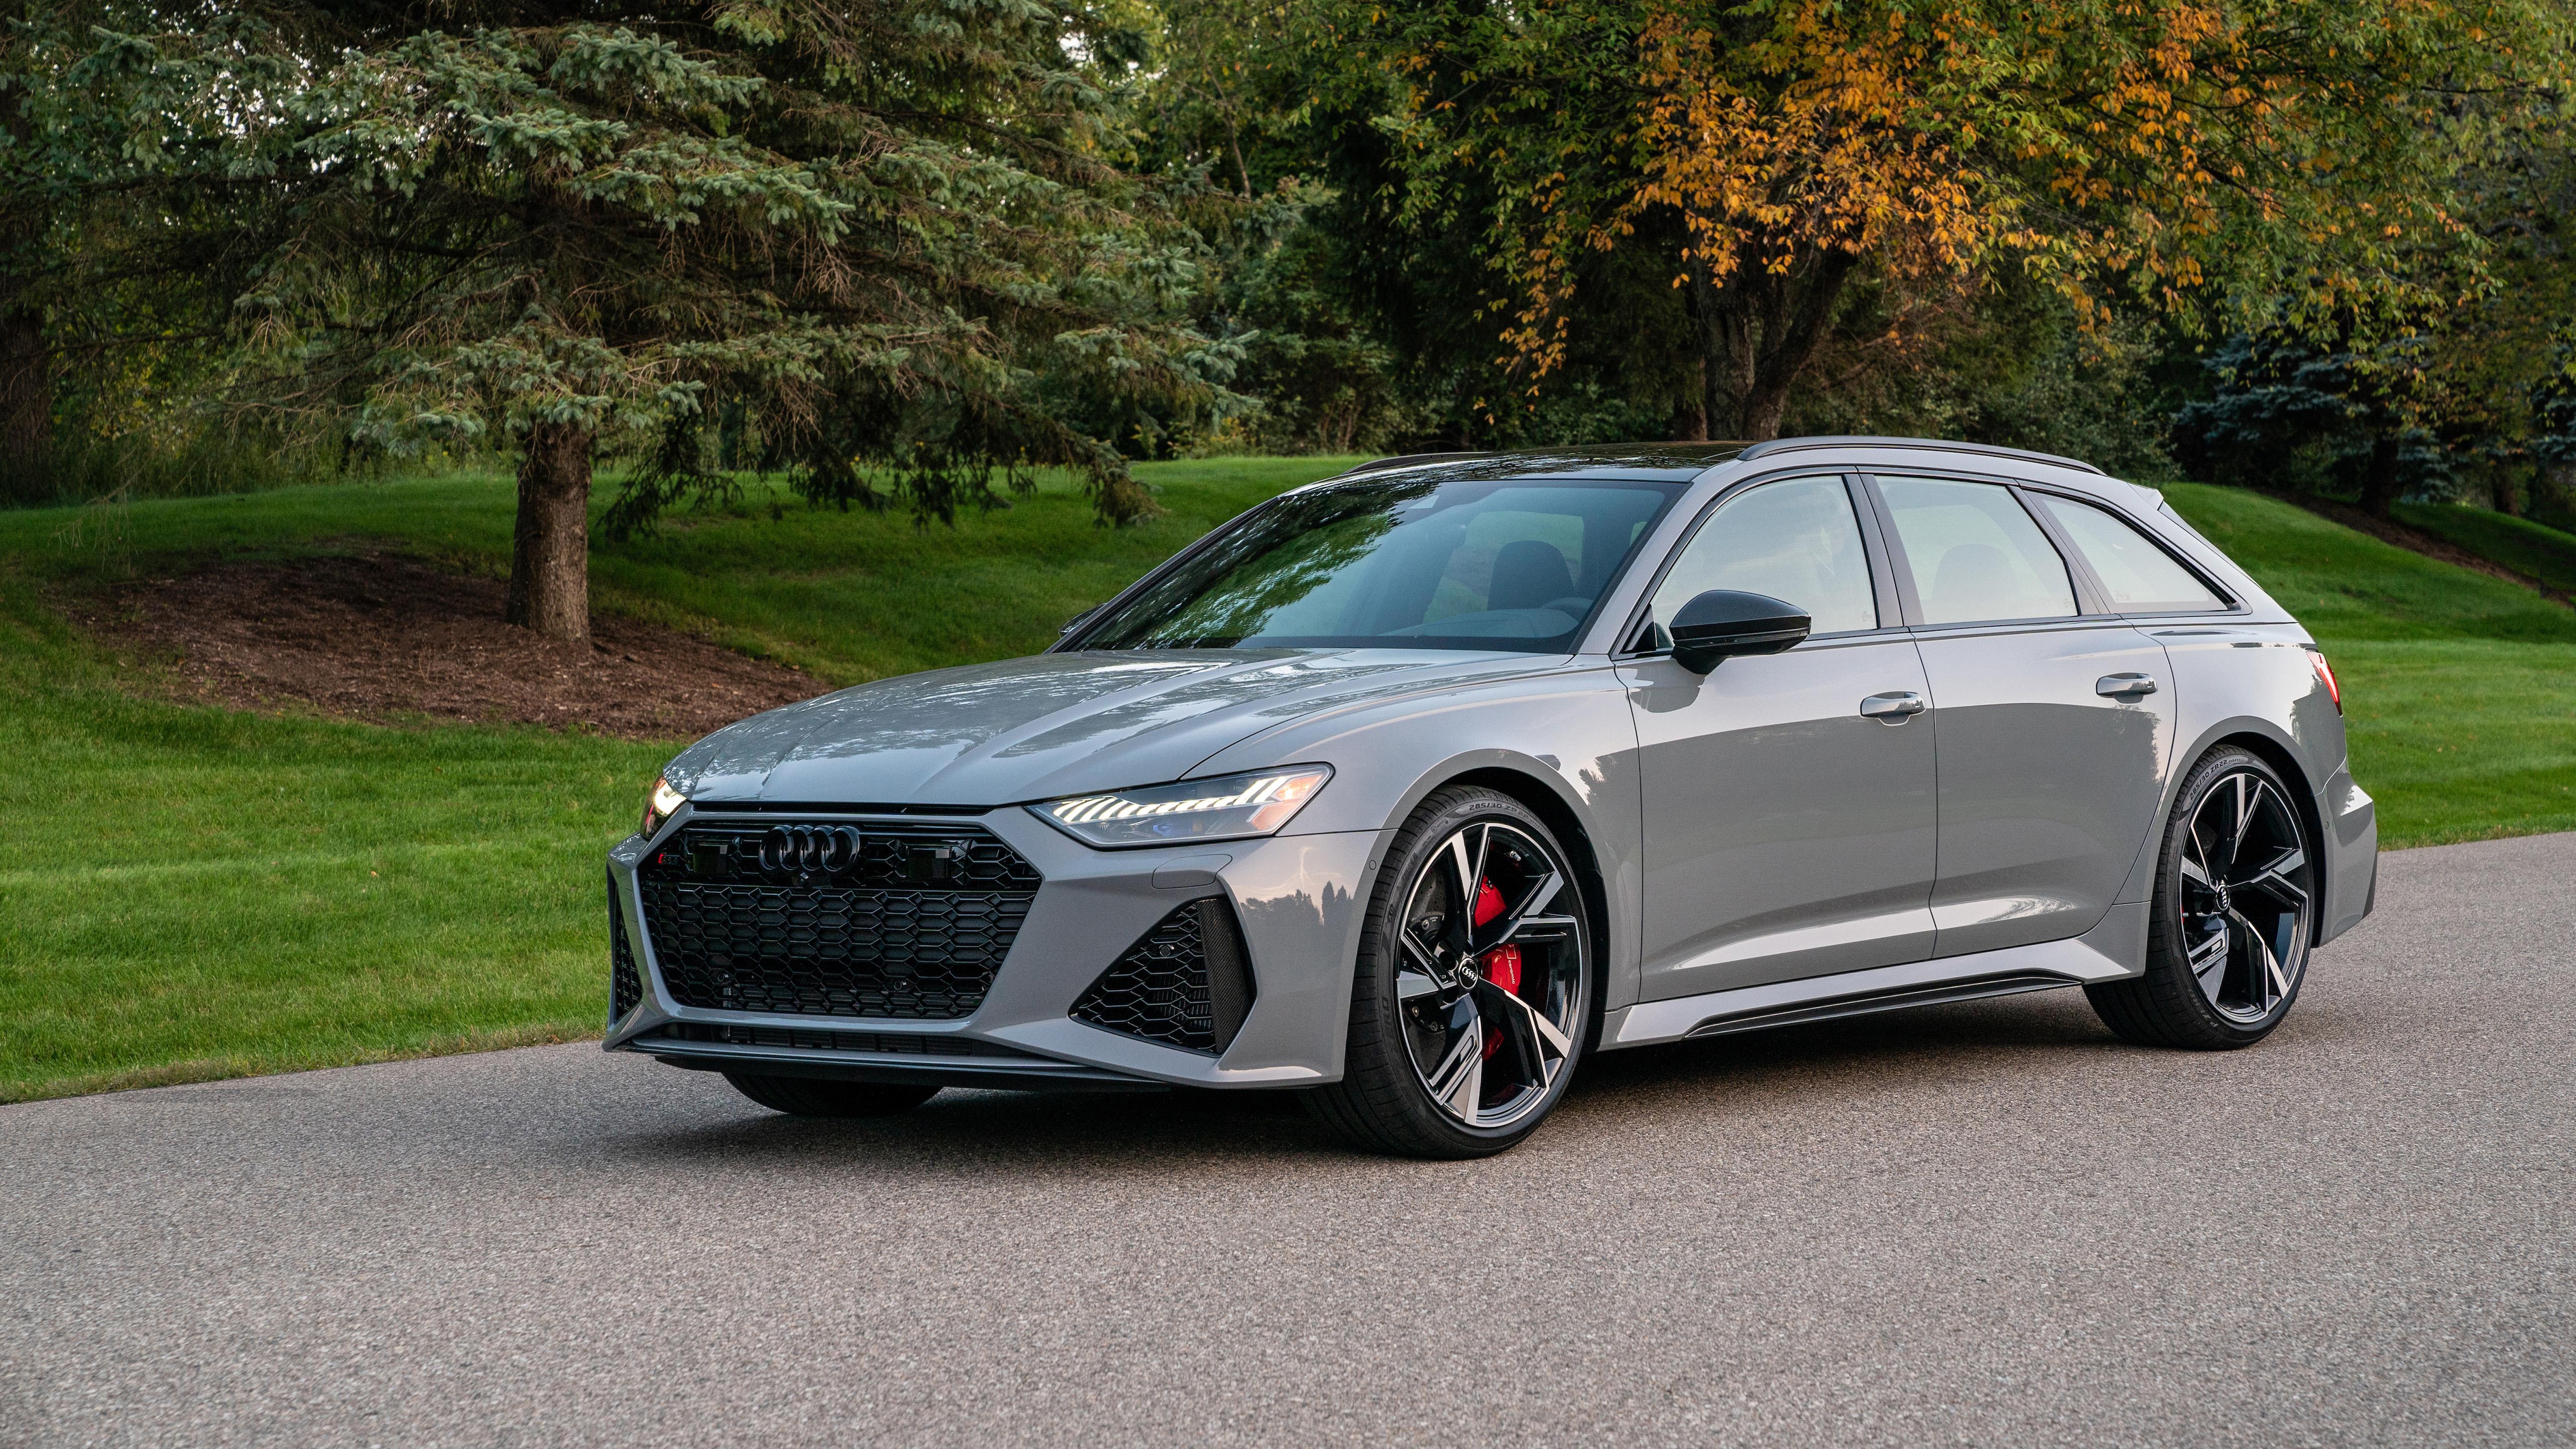 2021 Audi RS 6 Avant 5K Wallpaper   HD Car Wallpapers   ID ...